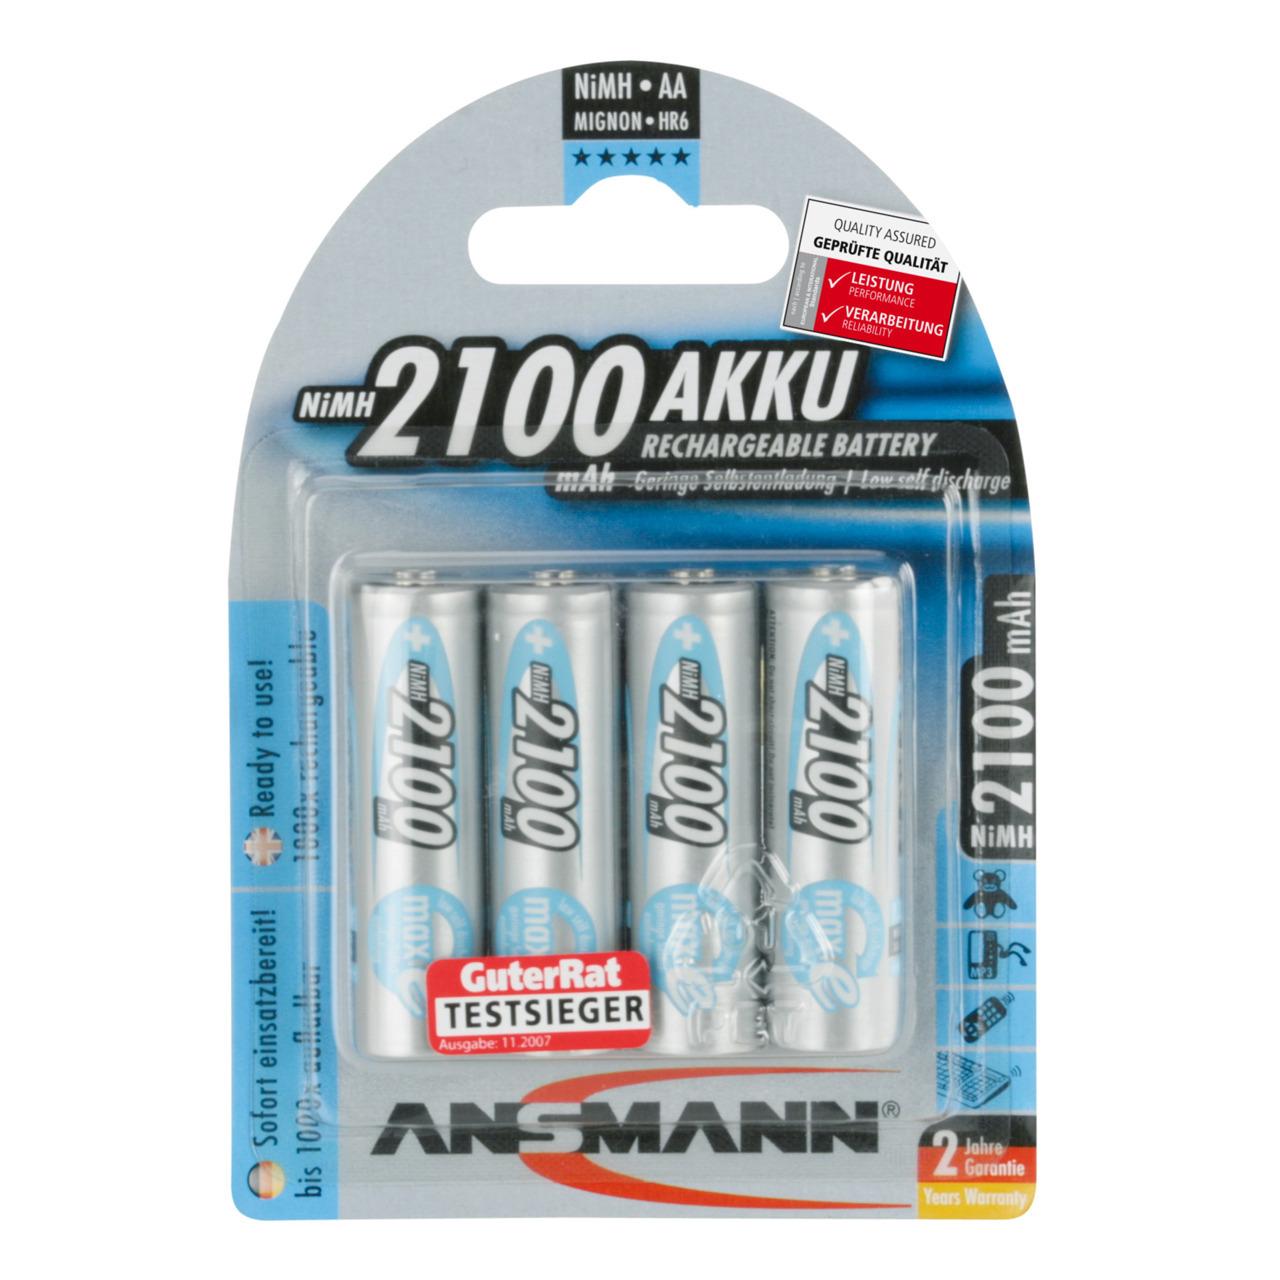 Ansmann NiMH Akku maxE- ready2use Mignon AA 2100mAh- R6 4er Pack